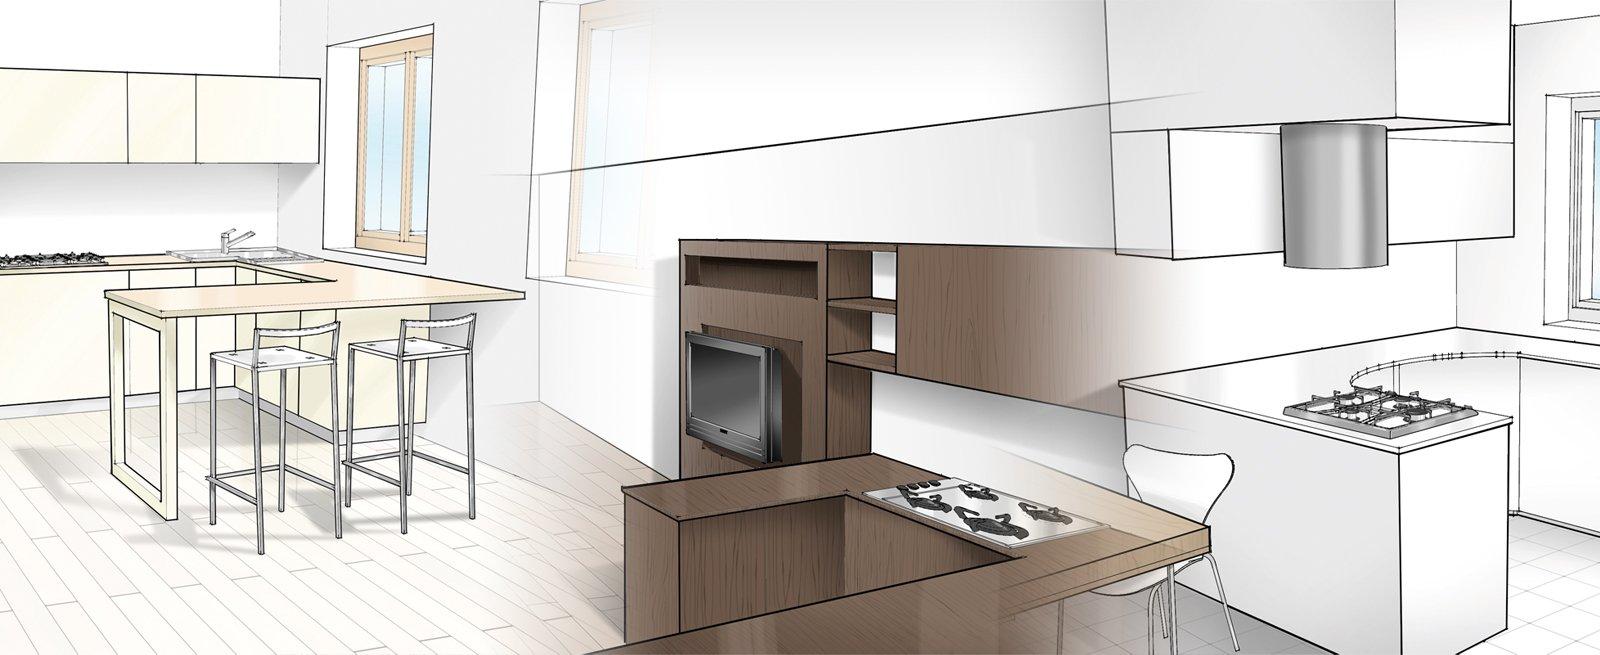 Tre soluzioni per una cucina cose di casa - Soluzioni angolo cucina ...